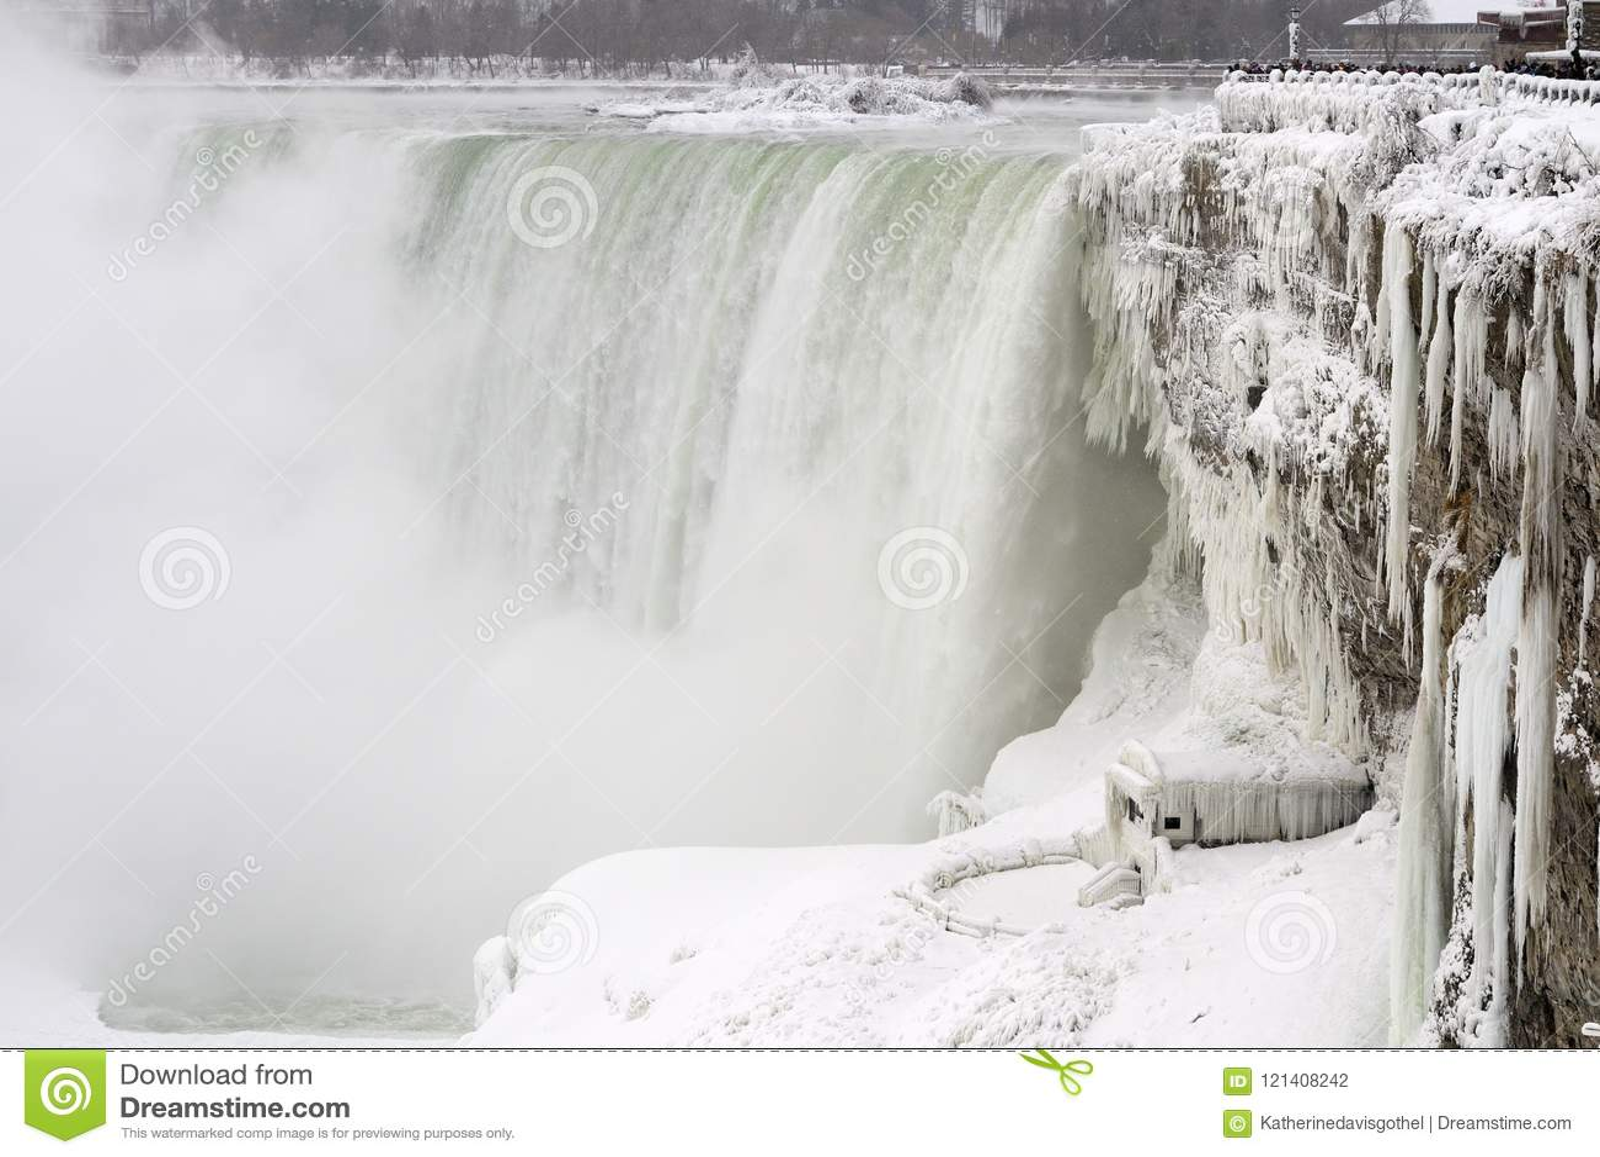 Niagara Falls, ice and snow, winter